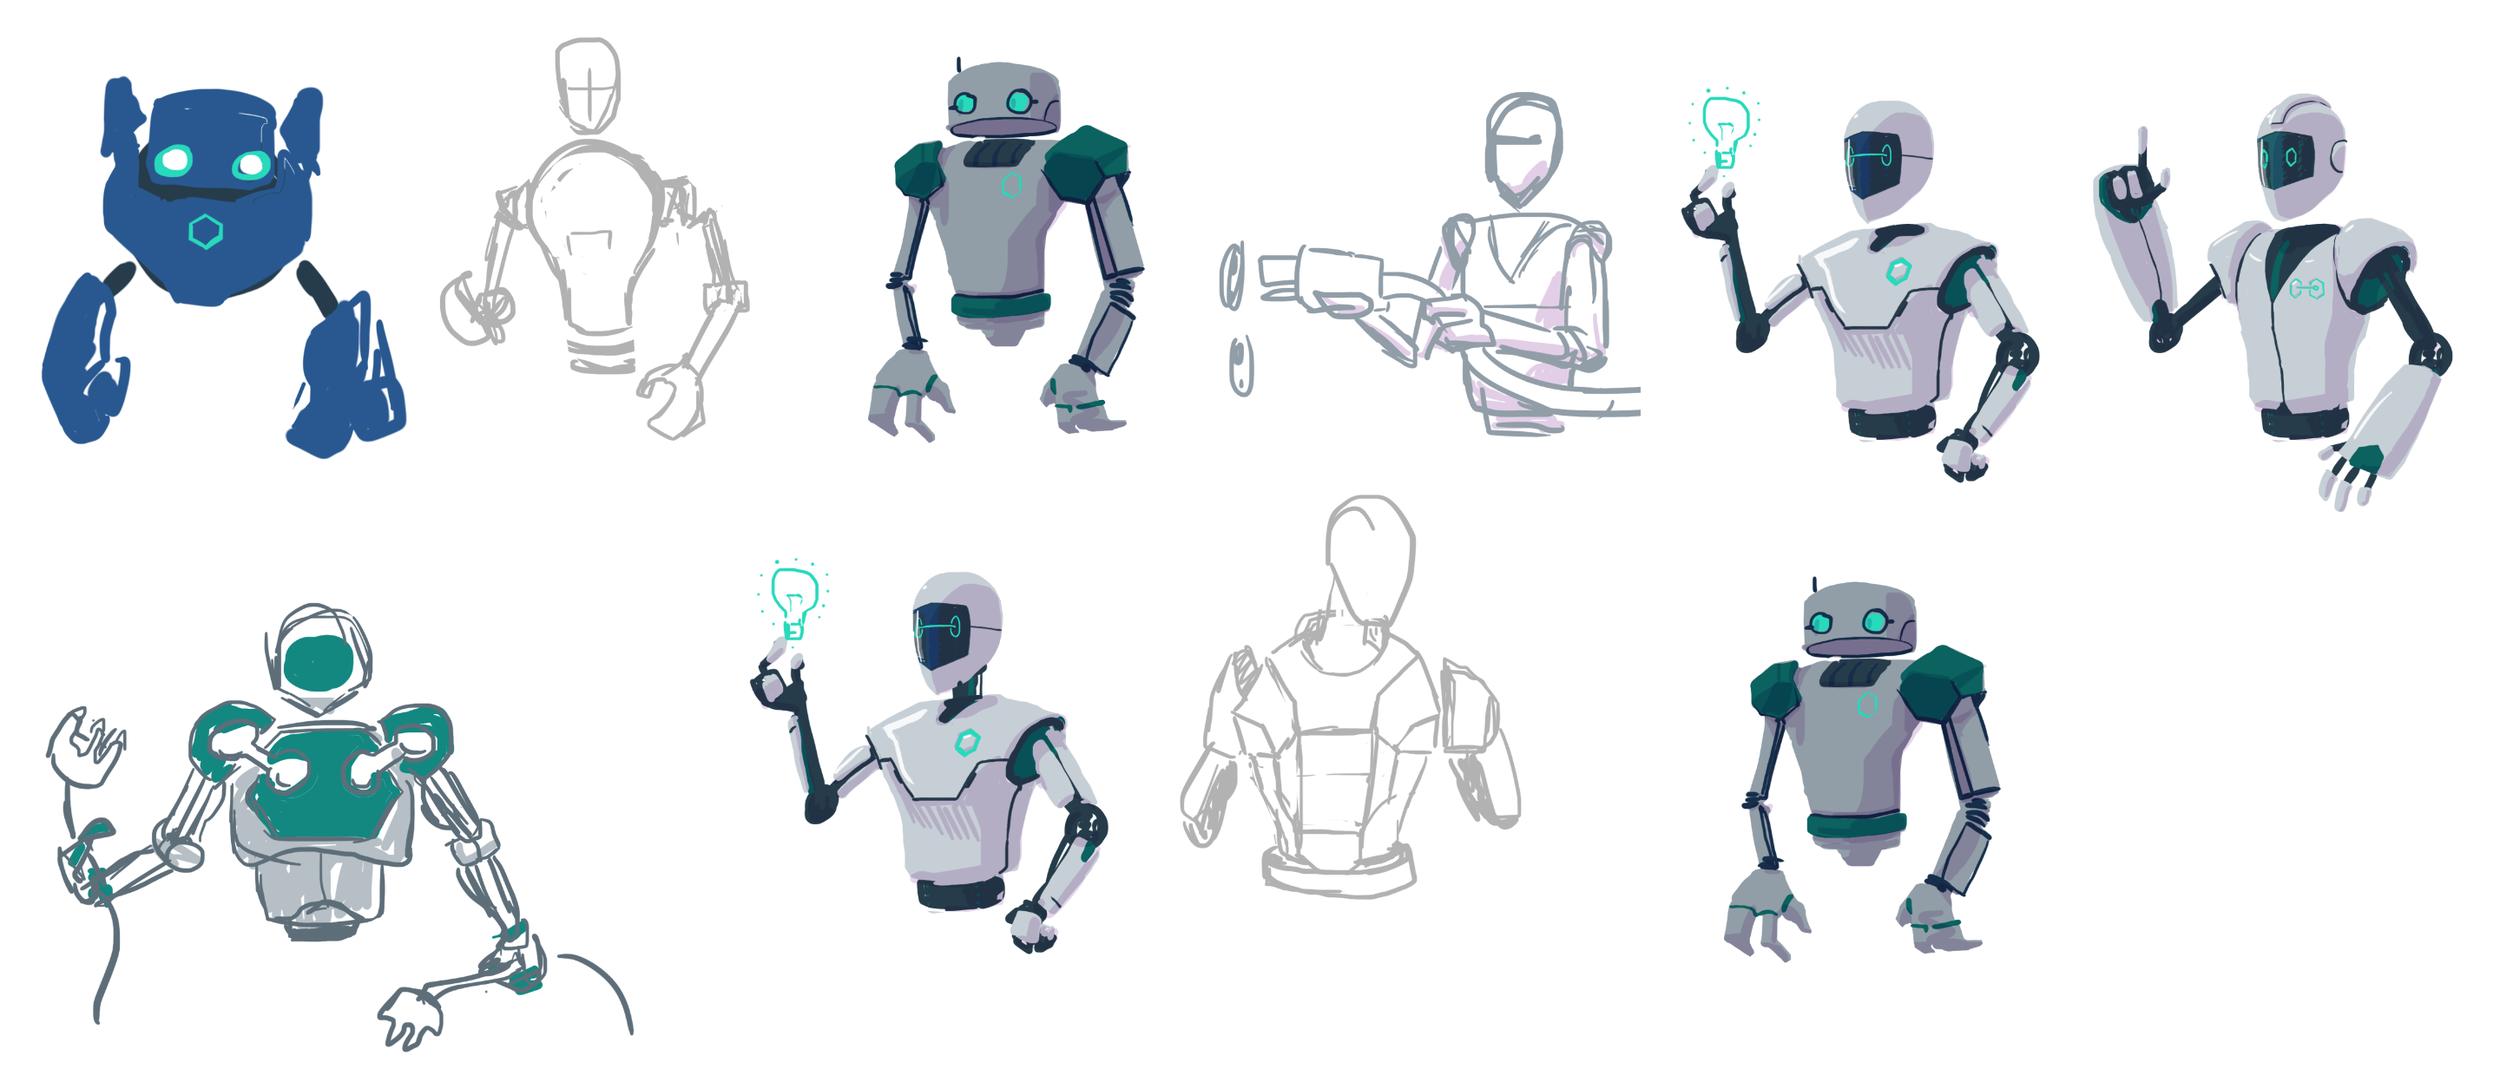 Exploring robot silhouettes